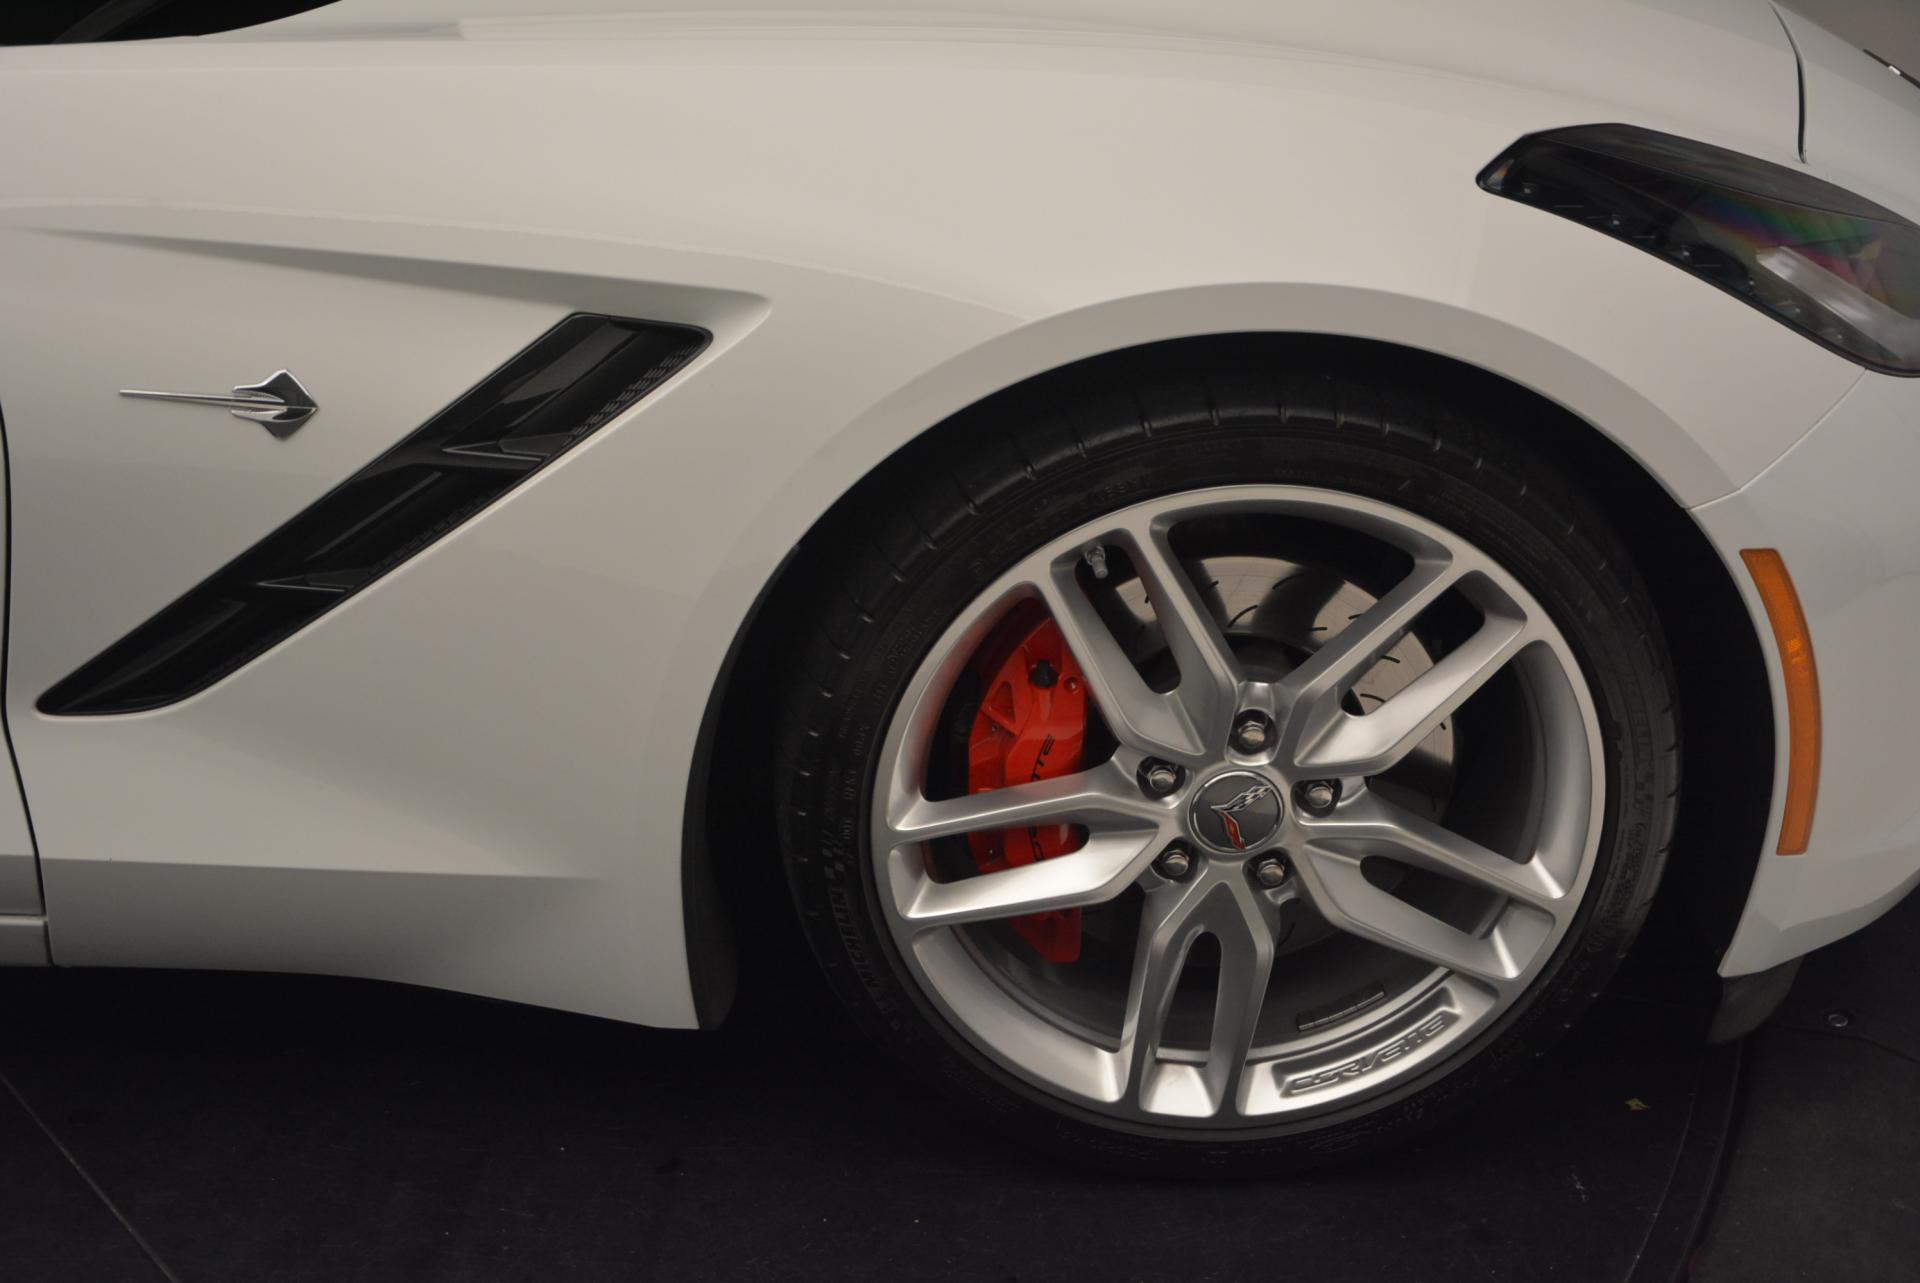 Used 2014 Chevrolet Corvette Stingray Z51 For Sale In Greenwich, CT 529_p26